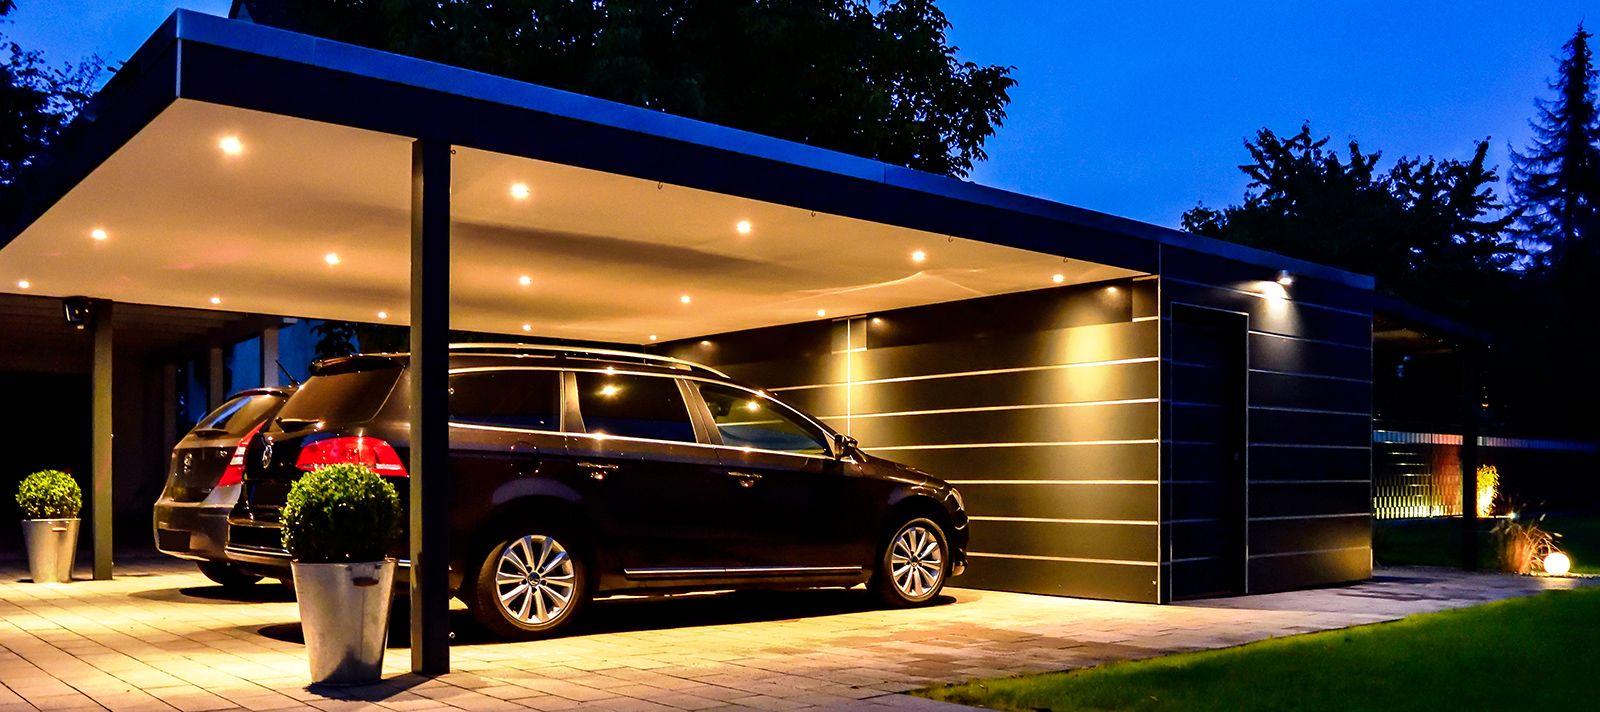 Carport Bauhaus Hpl Pfiff Carports Carport Hus Framsidor Und